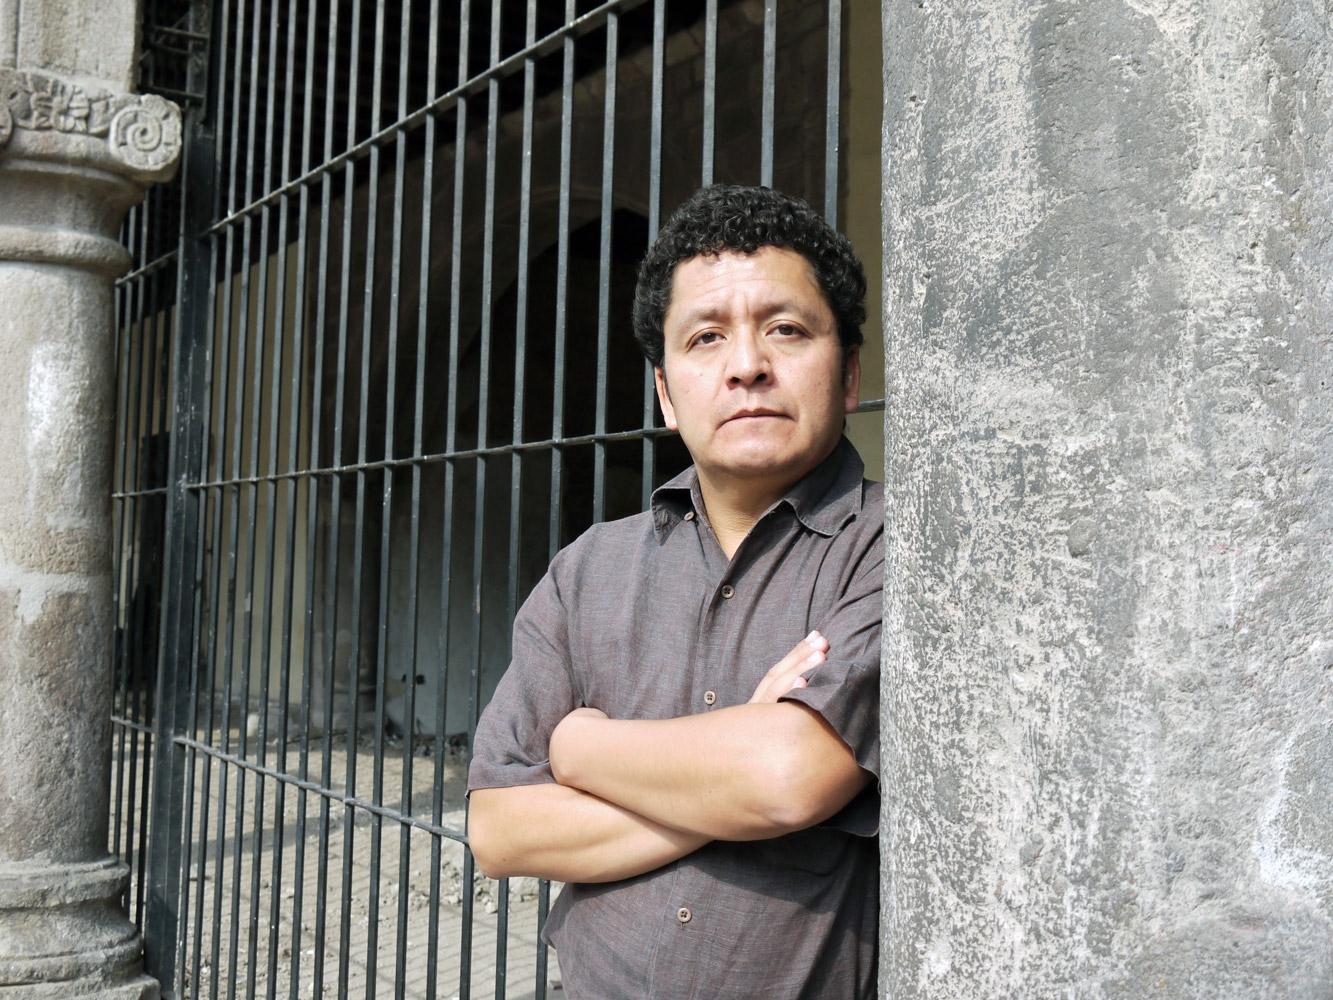 Javier perucho .jpg